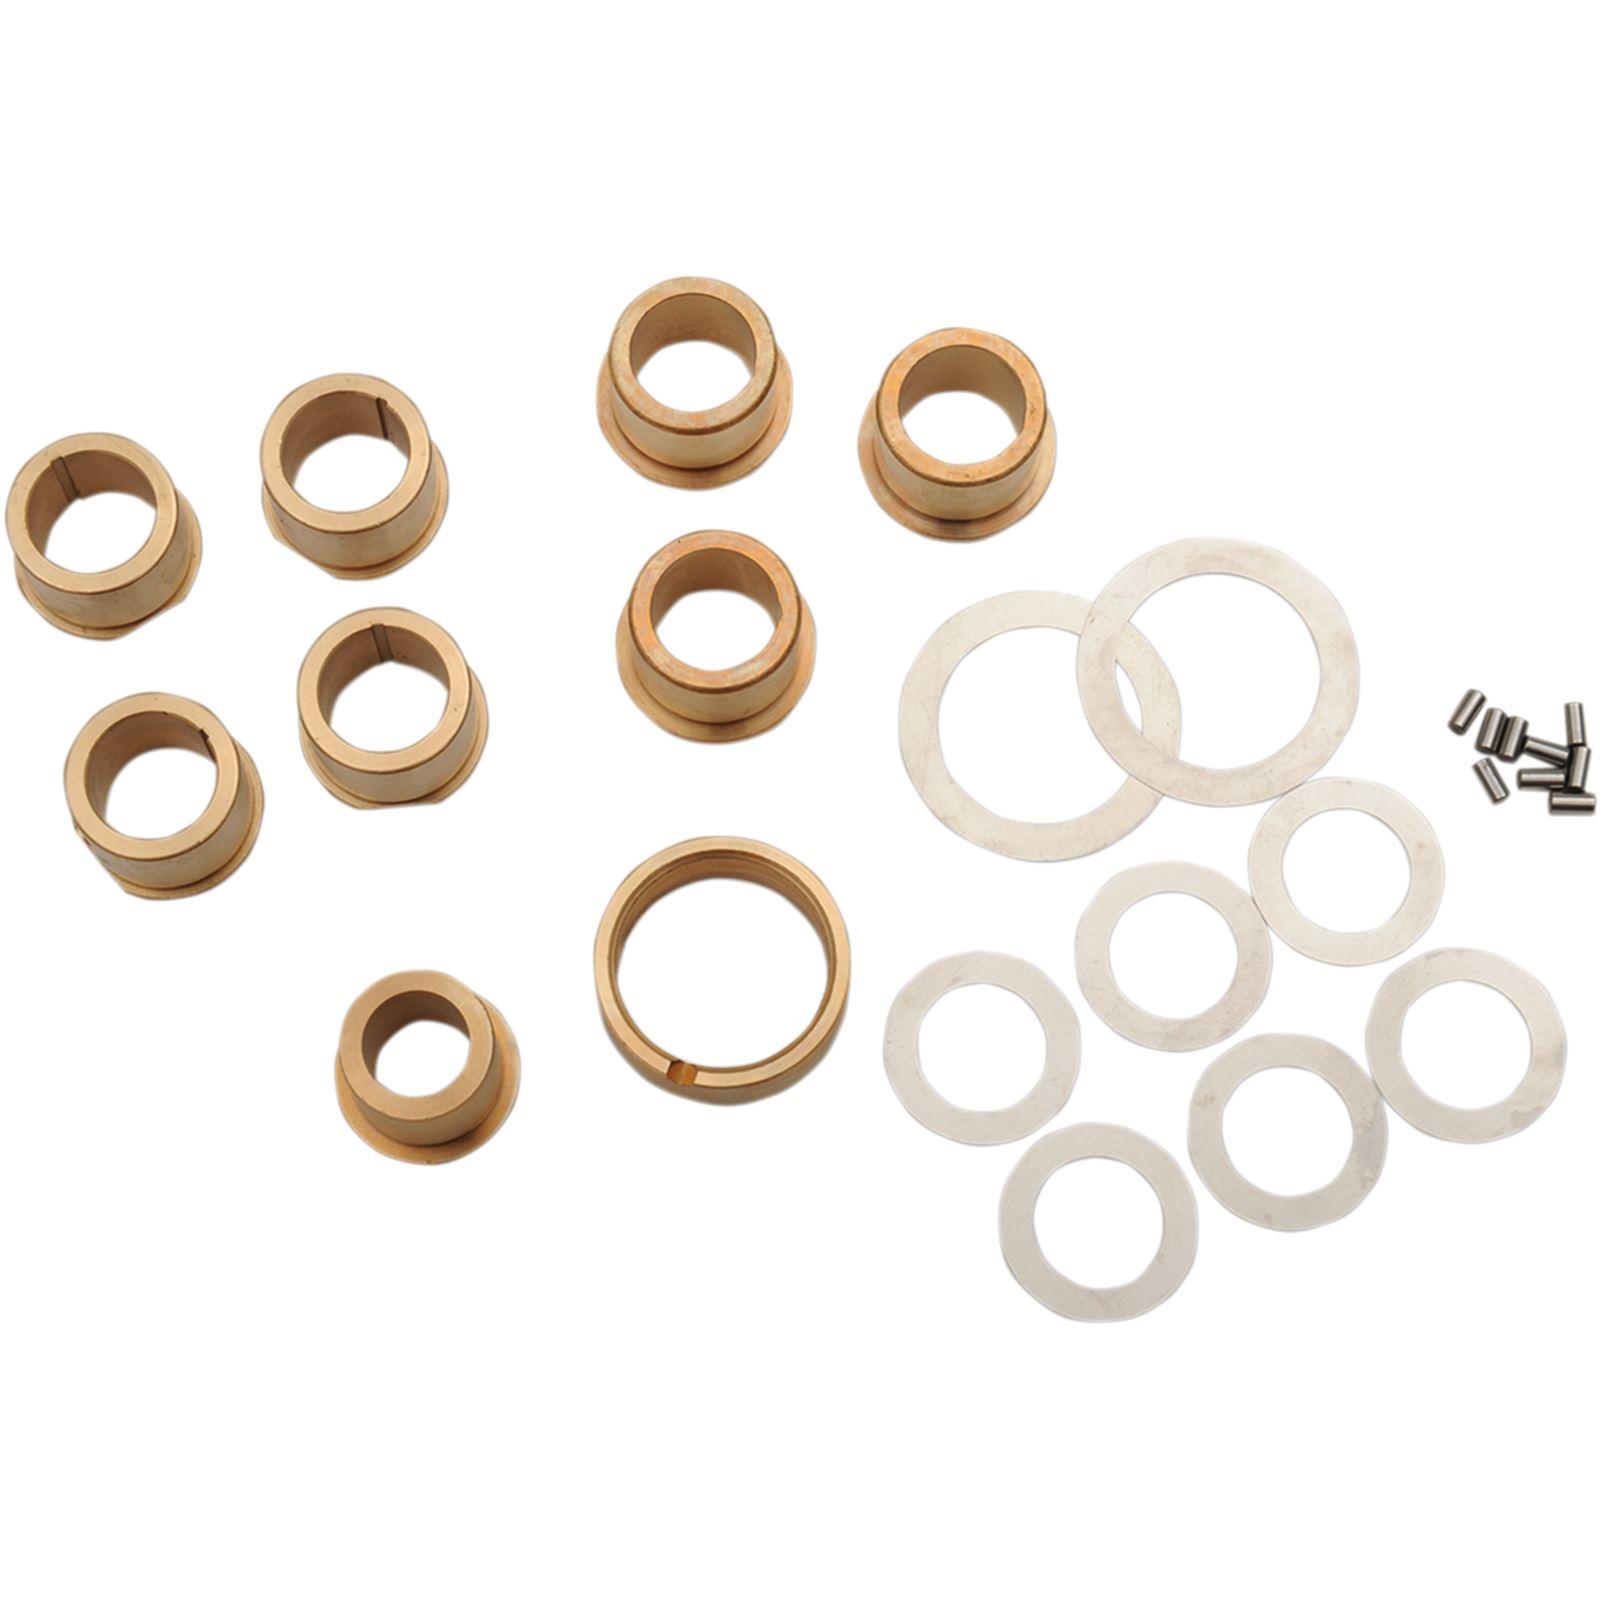 Eastern Motorcycle Parts Bushing Kit - Cam Gear - XL